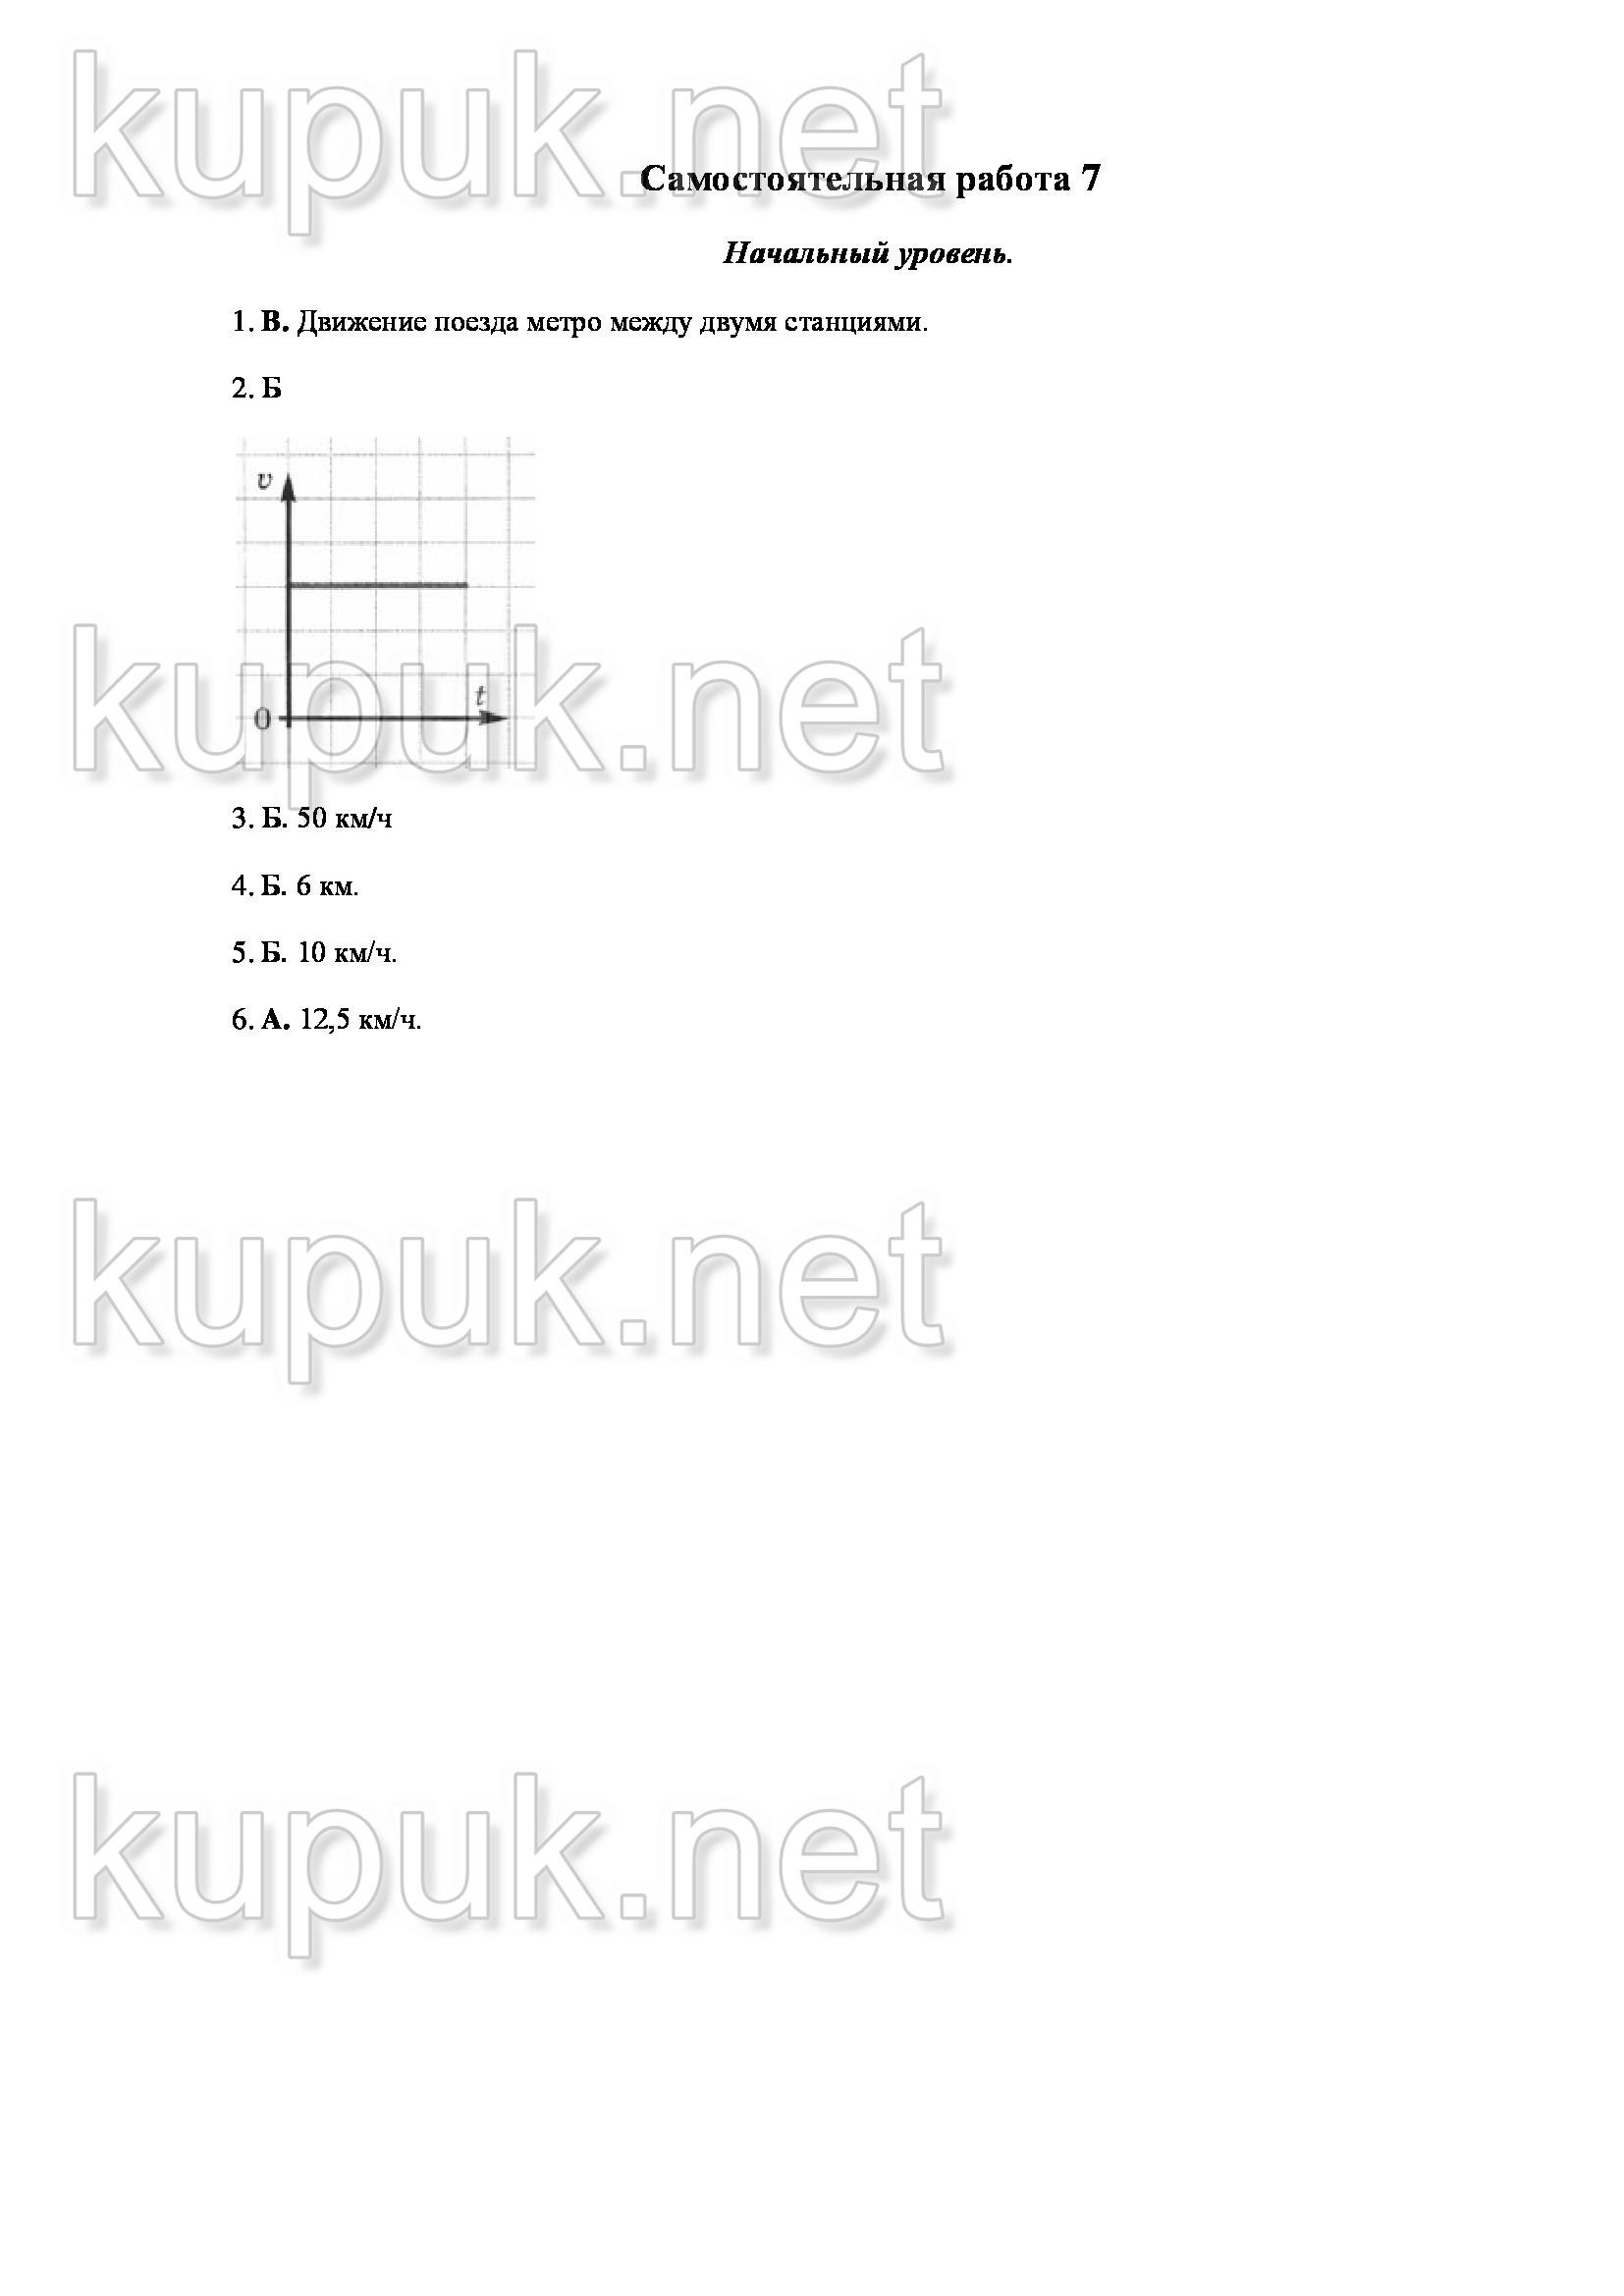 решебник класс л. 11 a. кирик